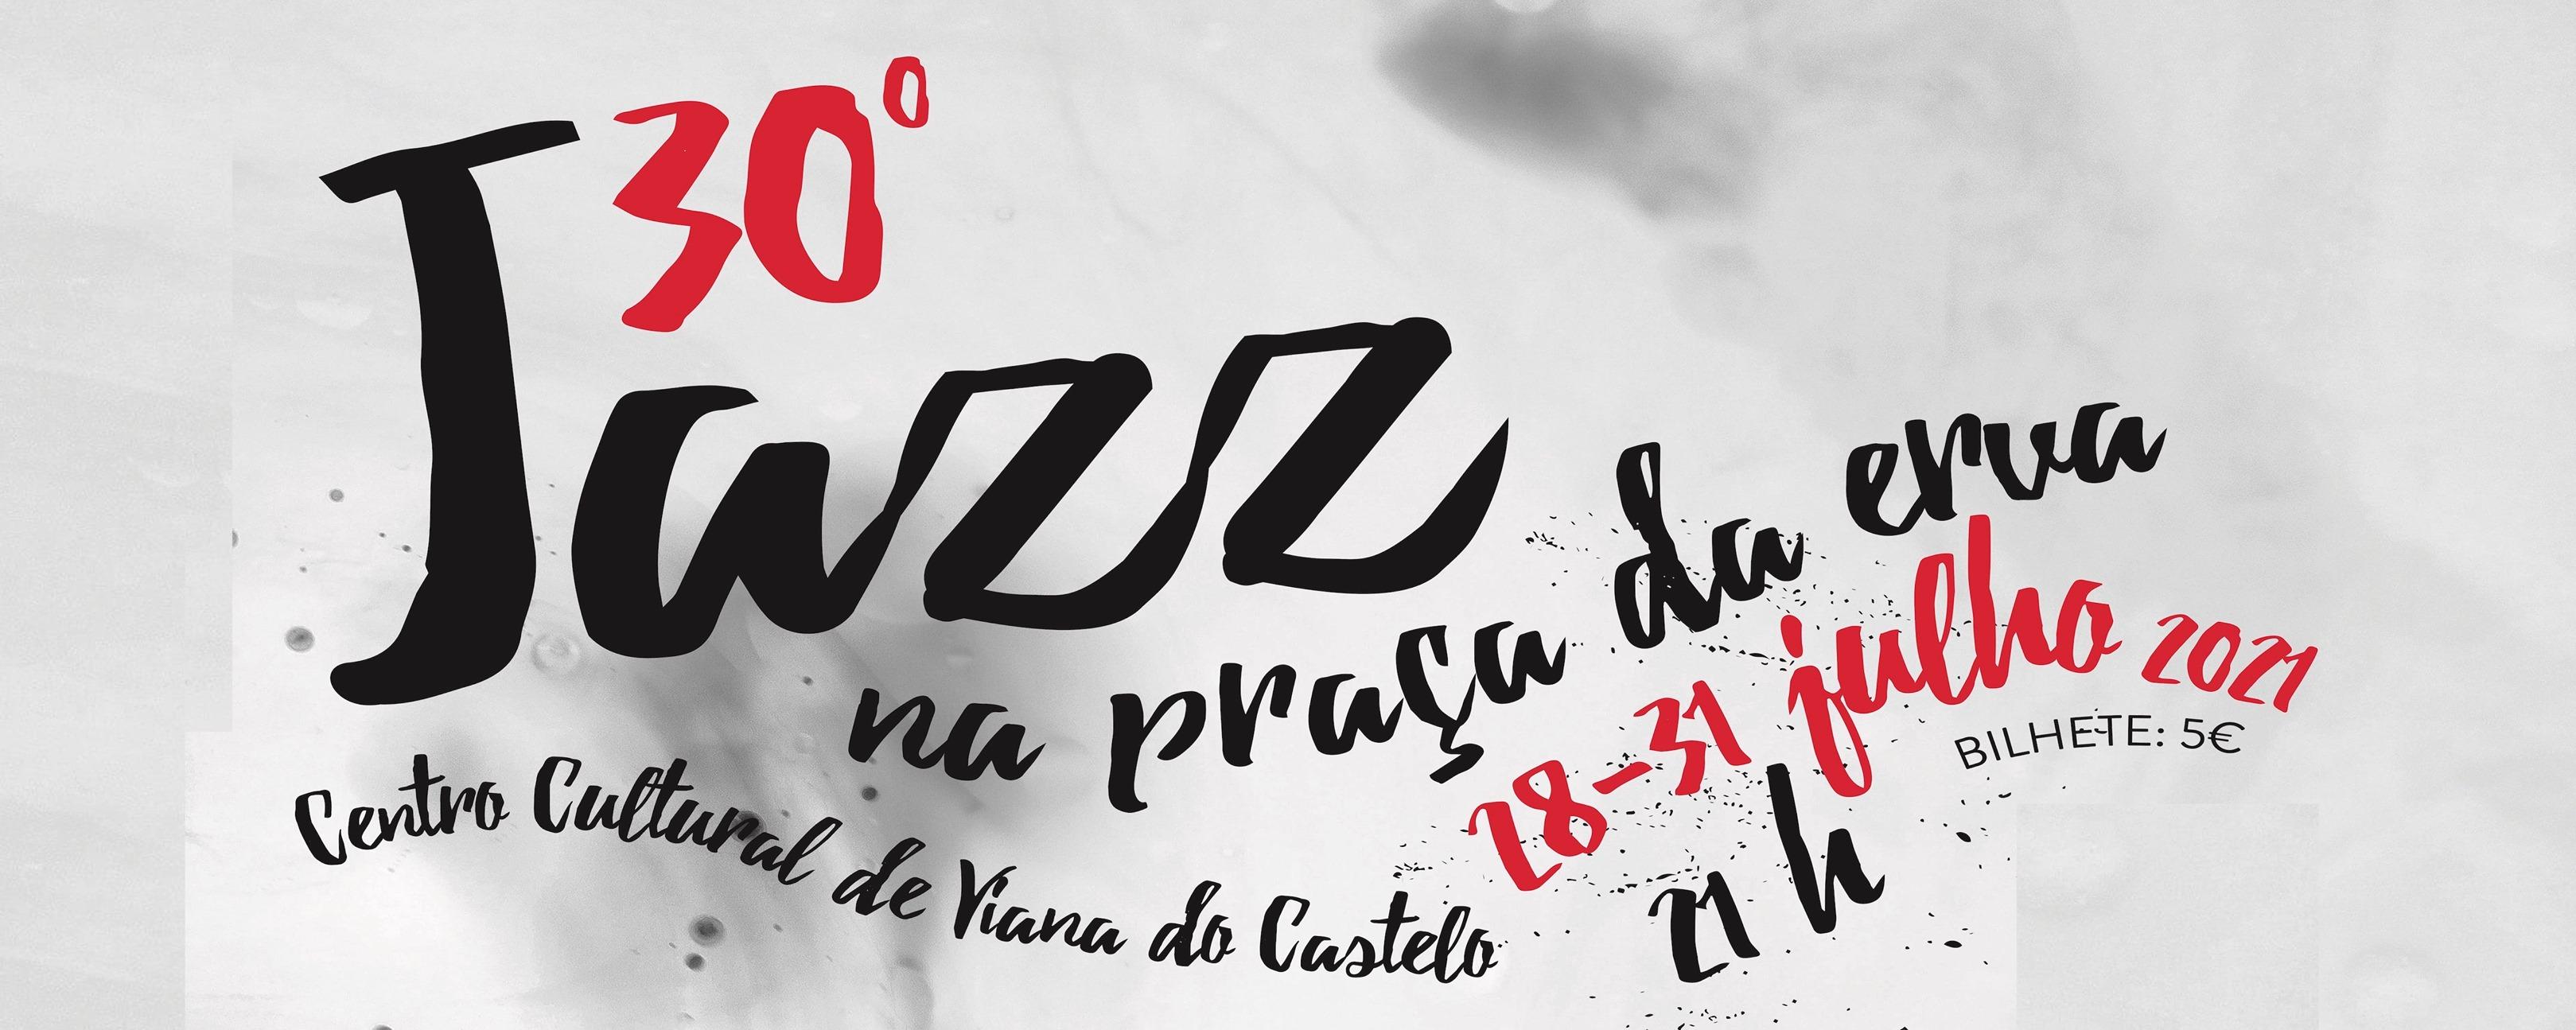 30º Jazz na Praça da Erva Festival